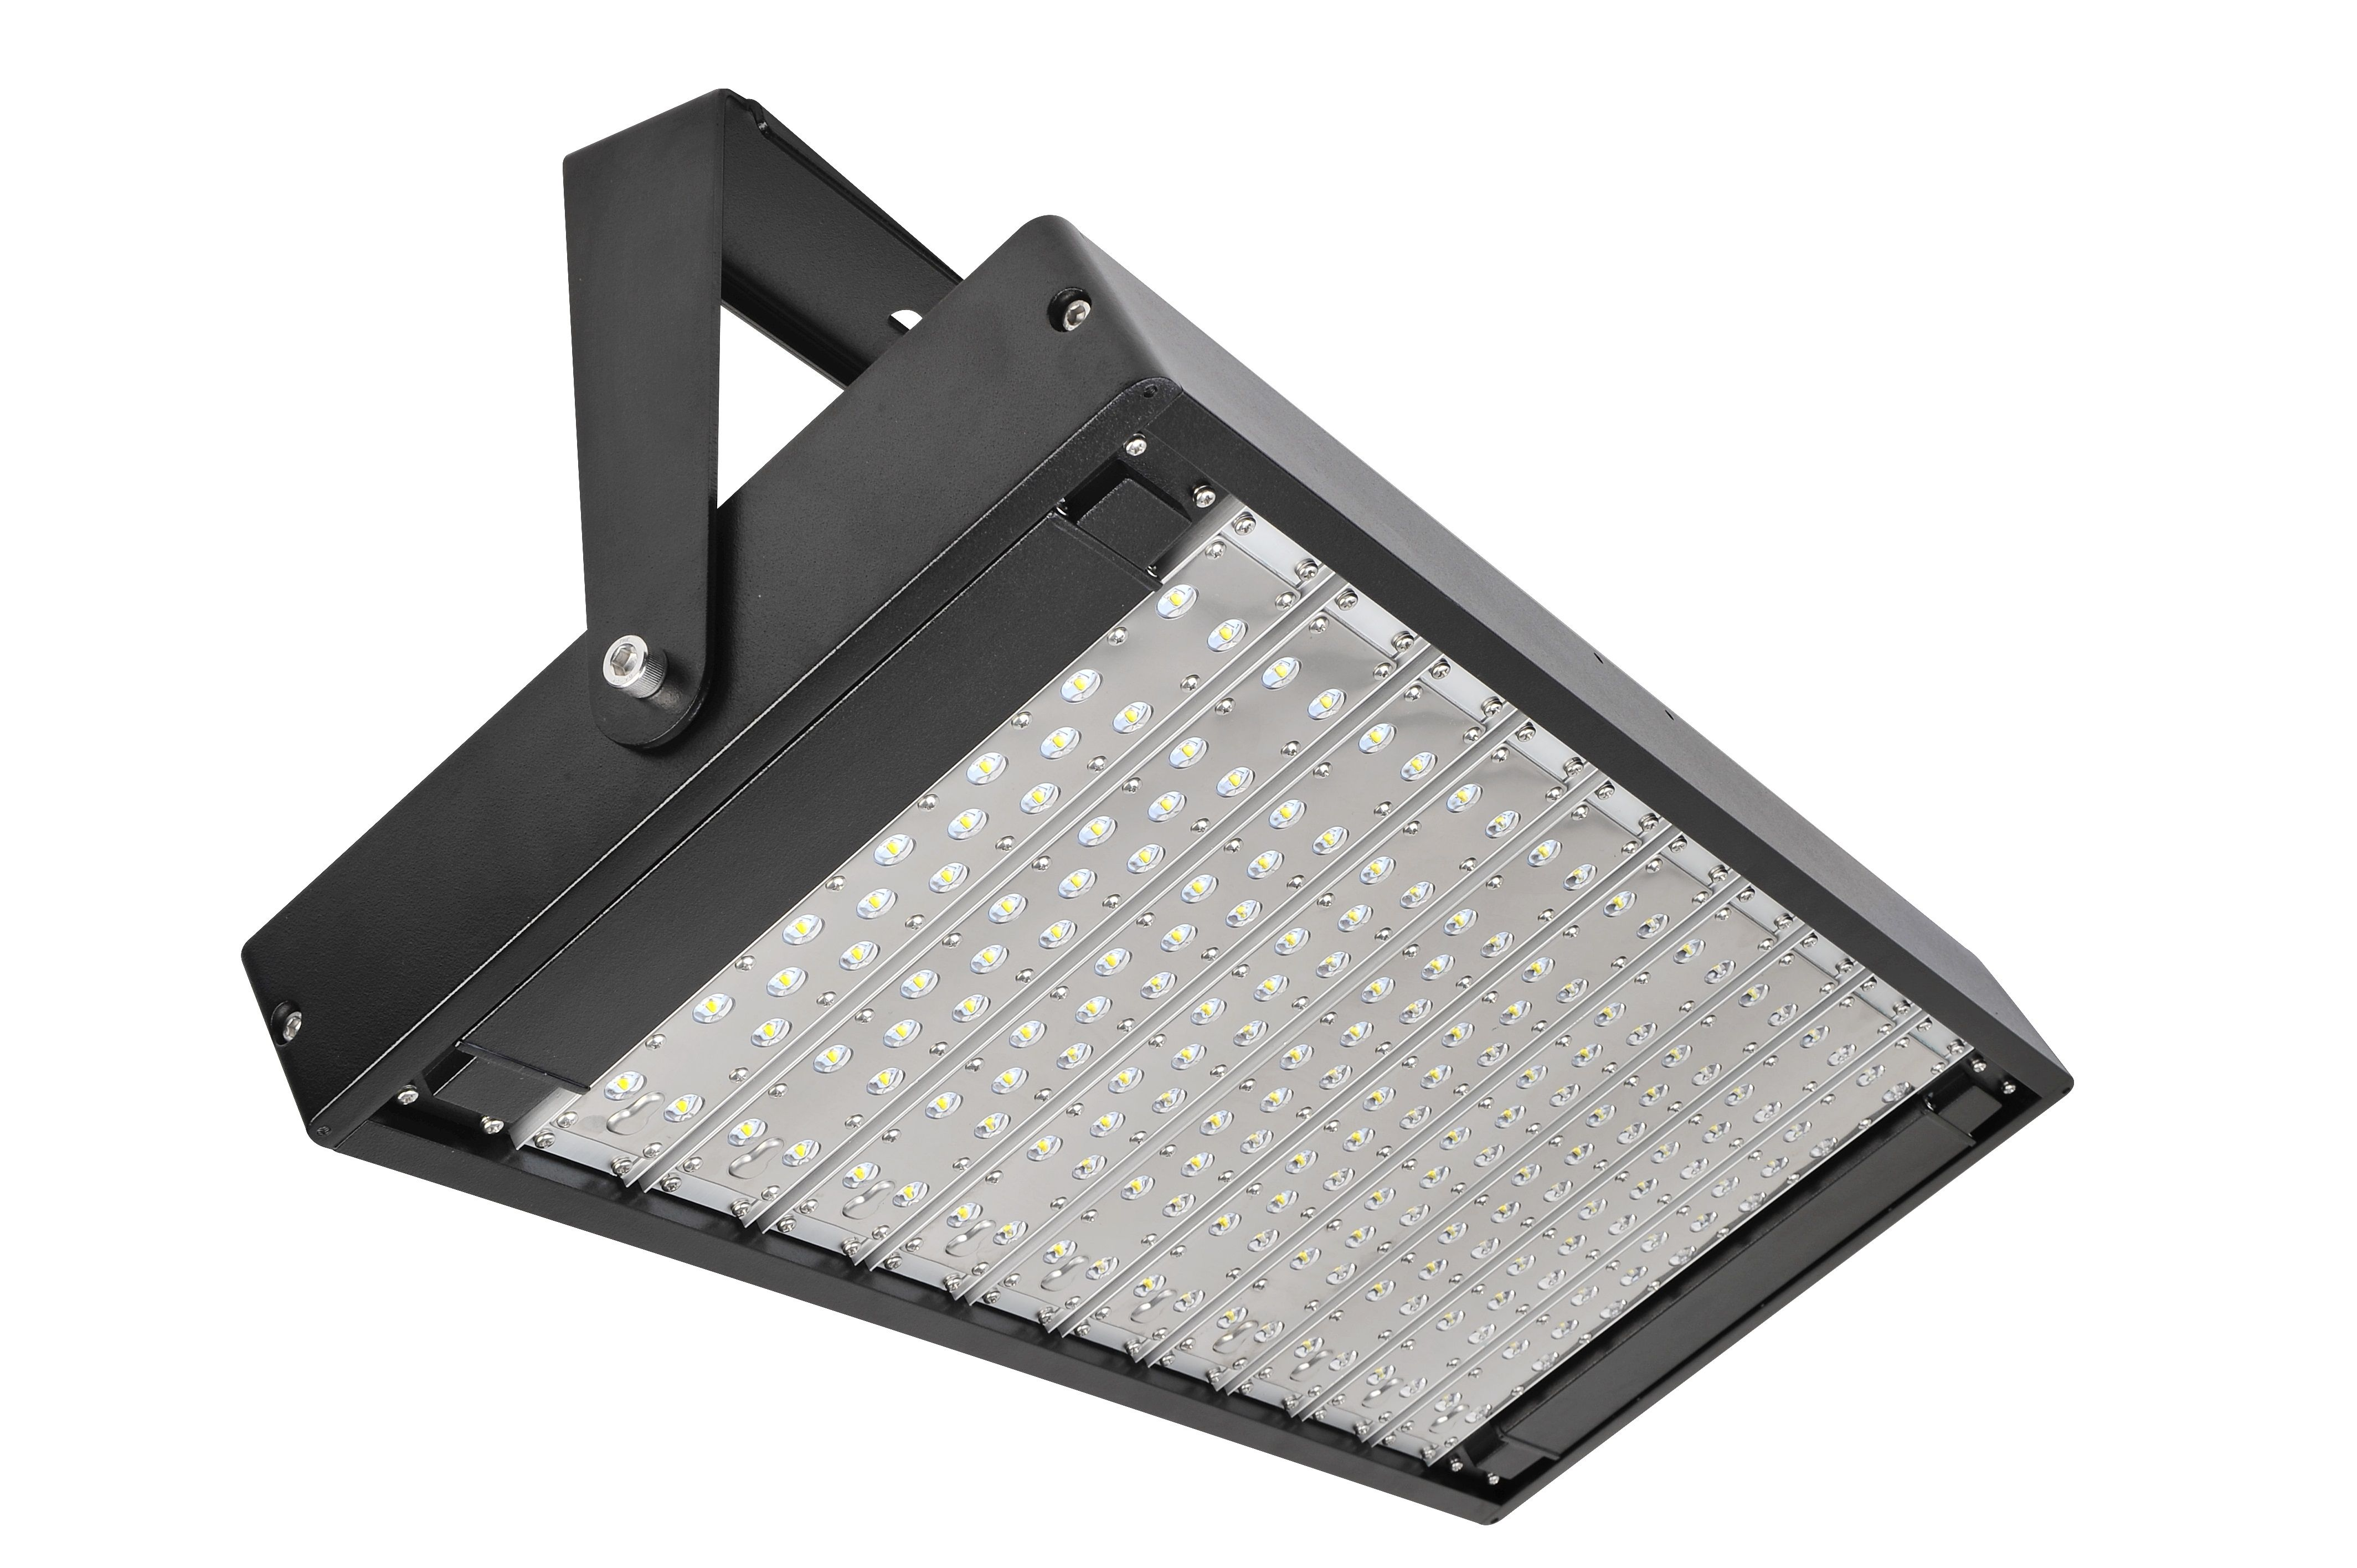 hi flood watt angle light res pics lumens new home led design of image front lights waterproof outdoor spot lighting inspirational